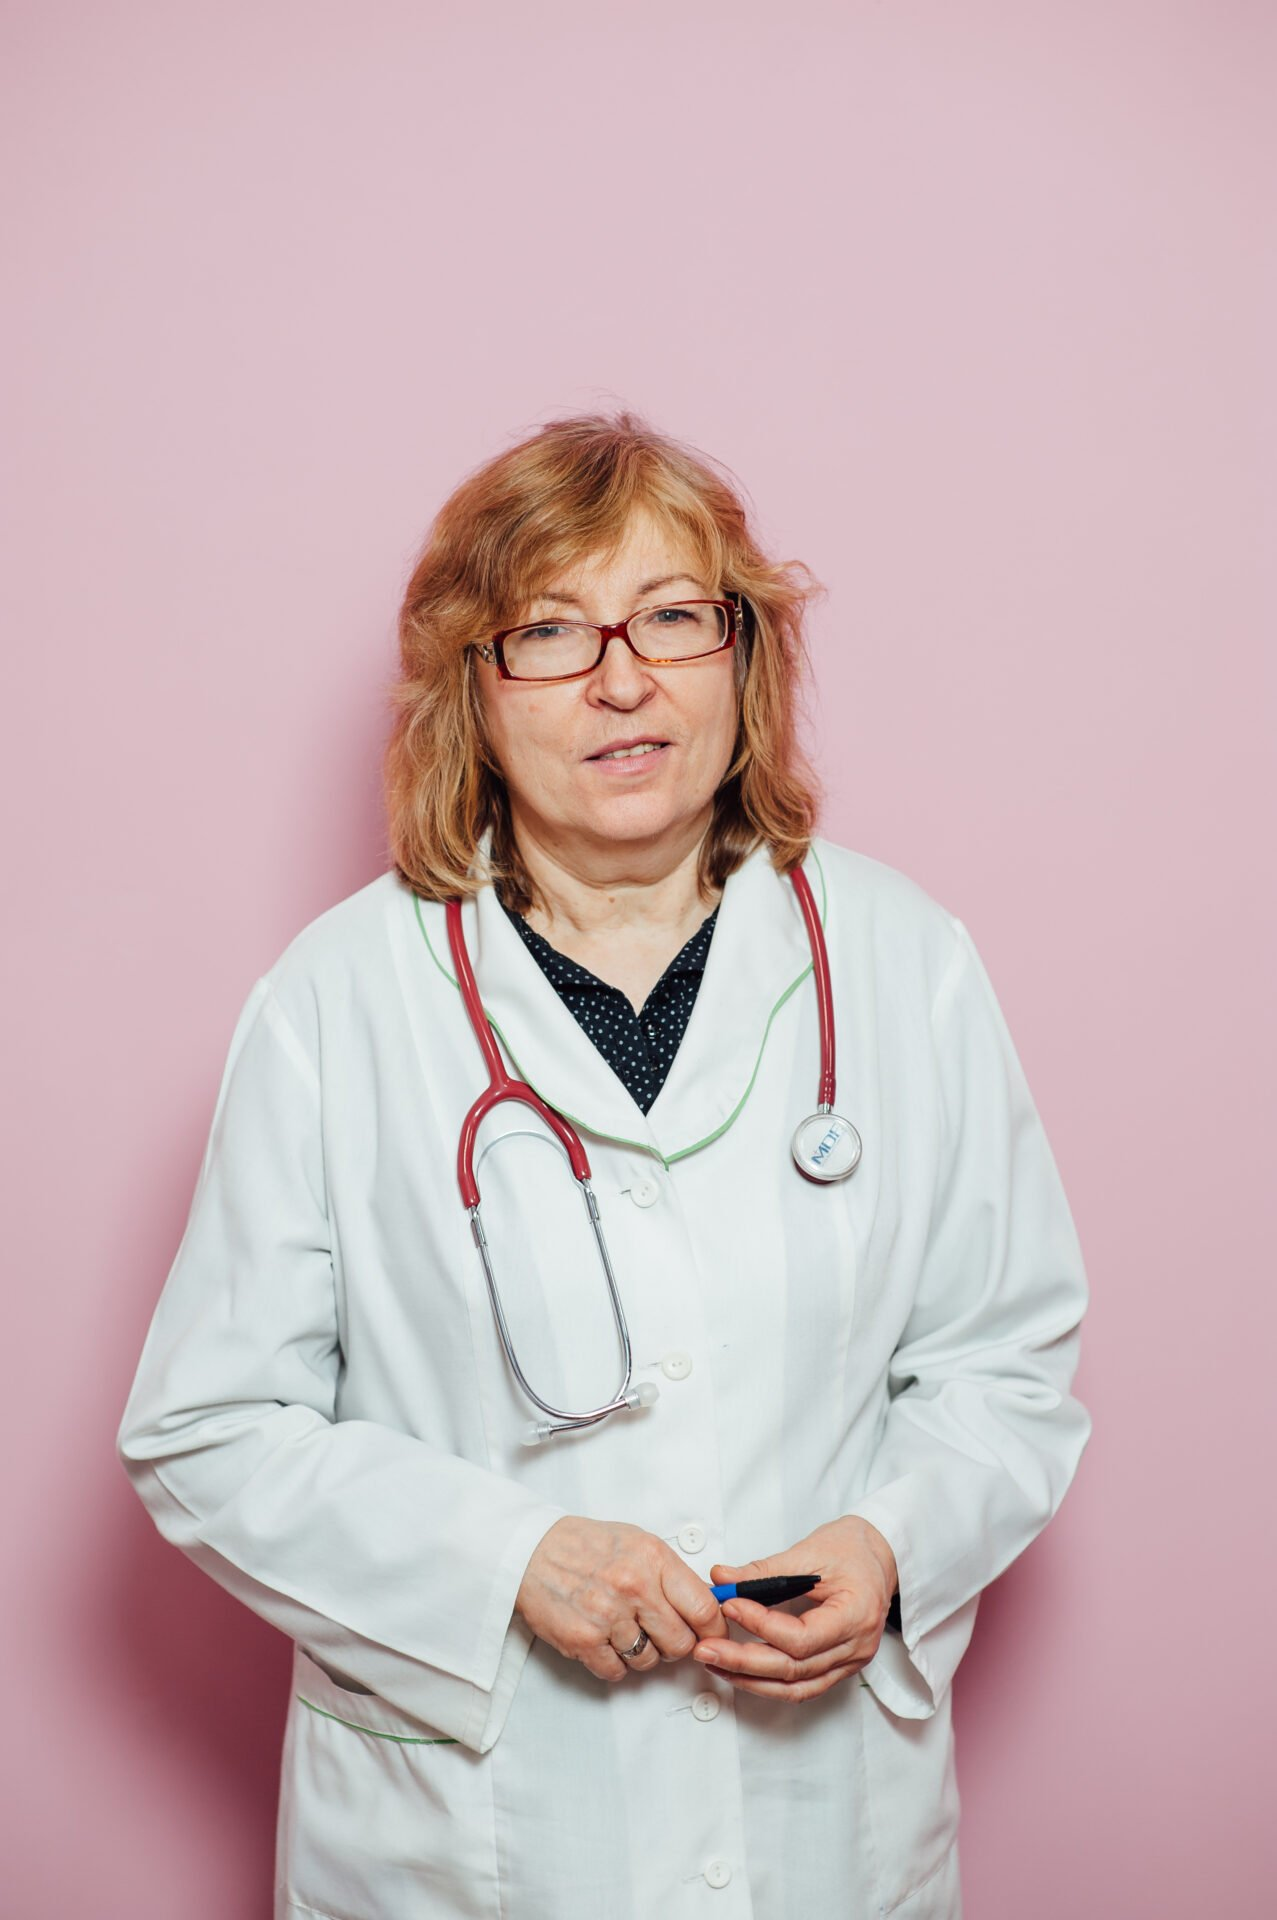 Кізілова Інна Артемівна Міська дитяча лікарня №5 детская больница Запорожье